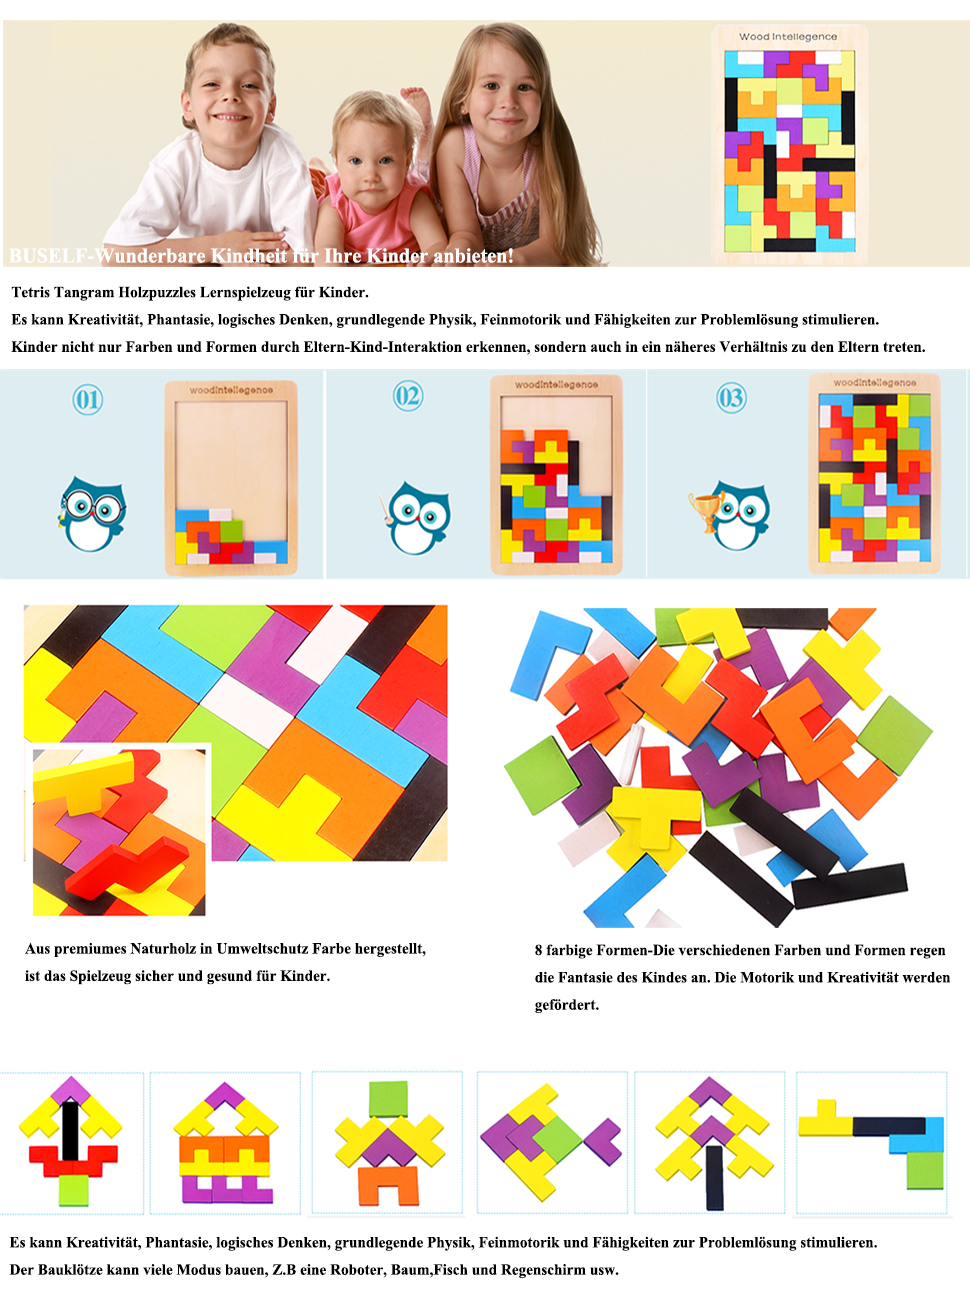 buself tetris holzpuzzle spielzeug ab 3 jahren jungen tetris tangram holzpuzzles lernspiele ab 2. Black Bedroom Furniture Sets. Home Design Ideas